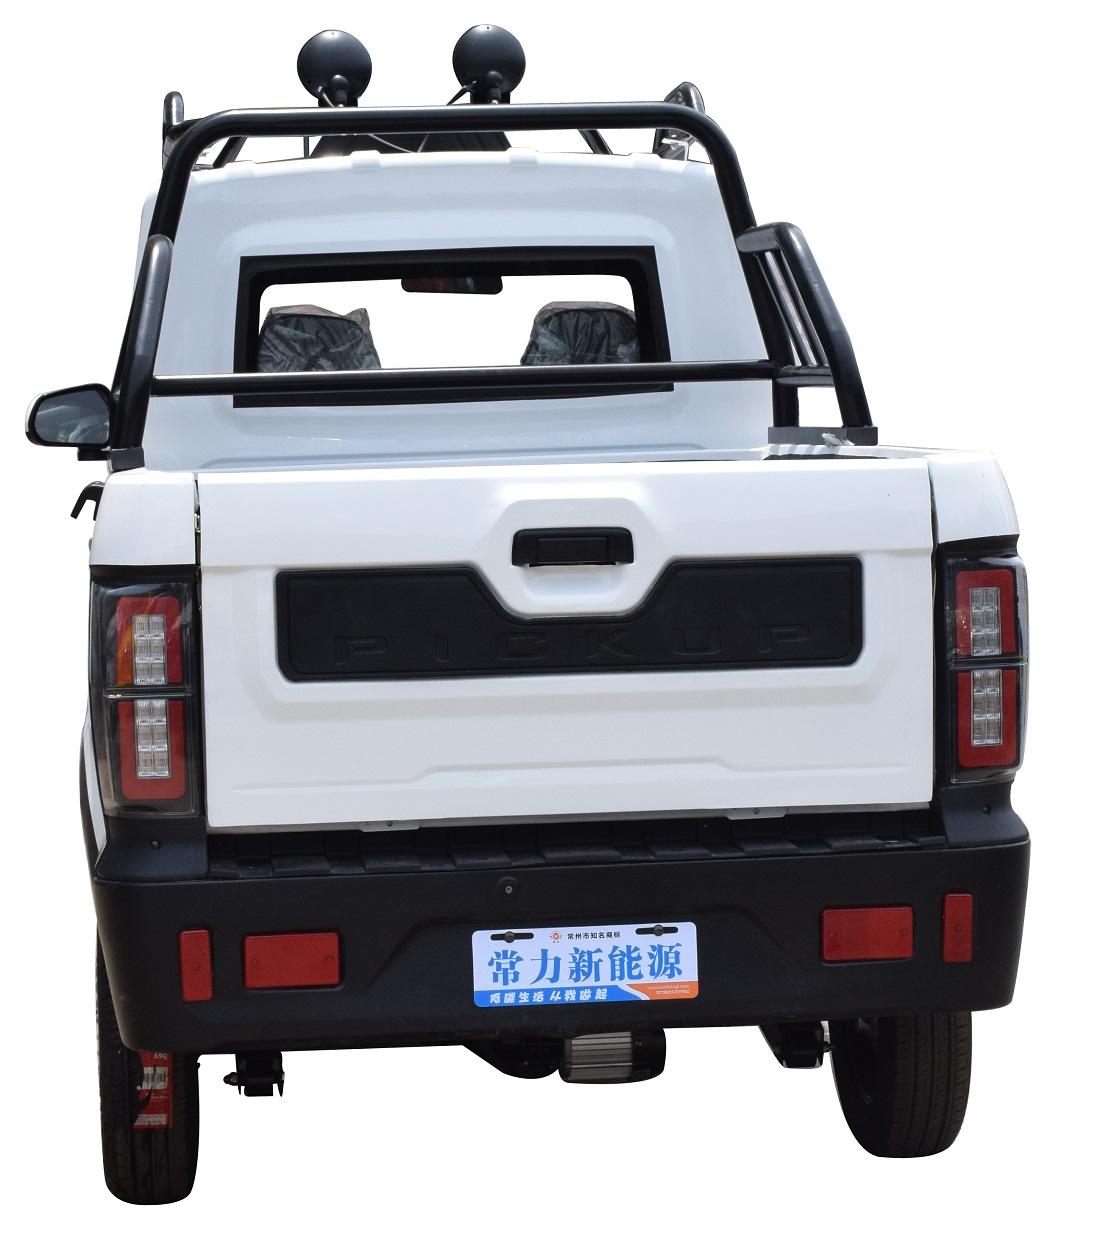 2021 Chang li Electric four-wheeler pickup truck adult truck electric car